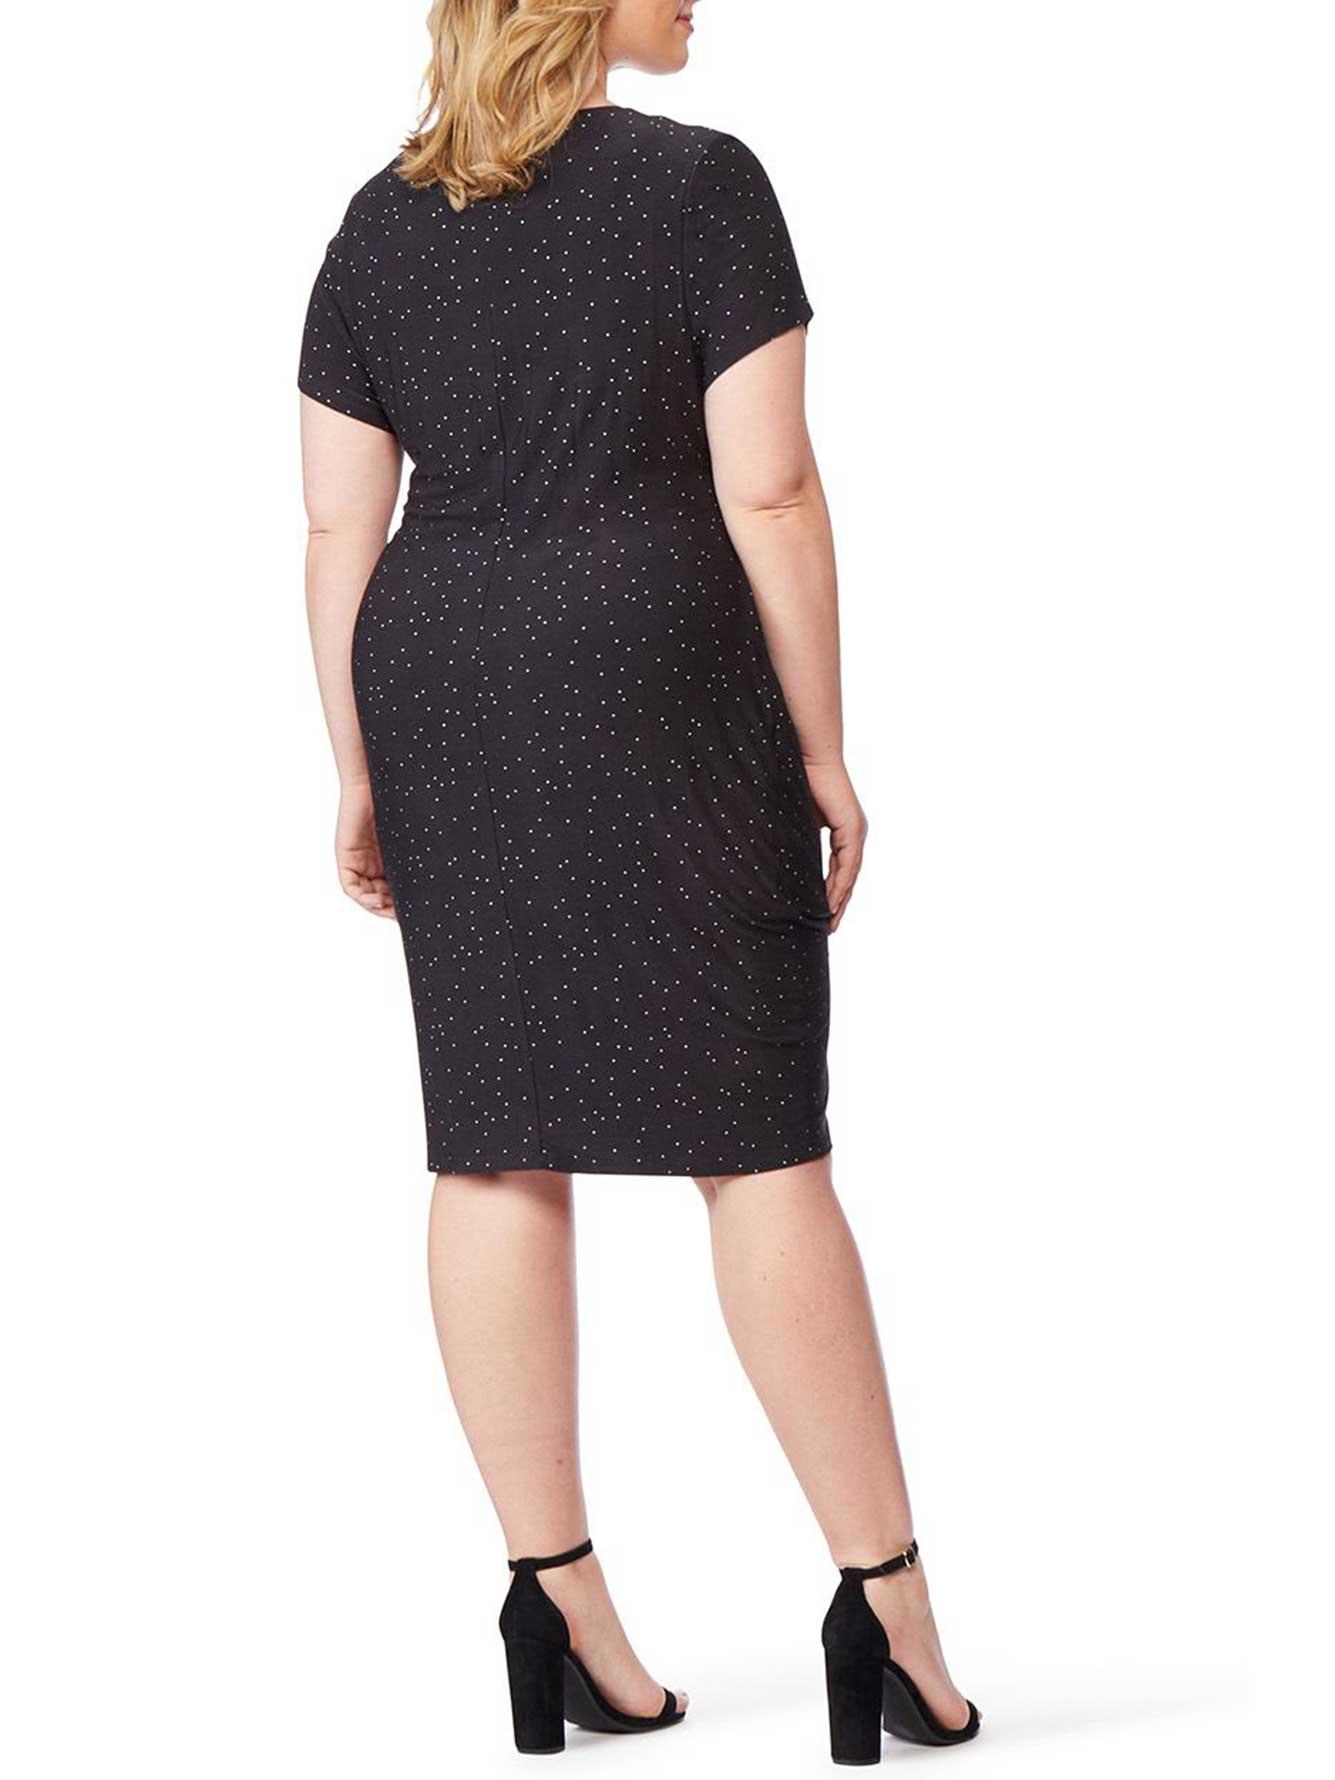 Fitted Faux-Wrap Dress - Rebel Wilson